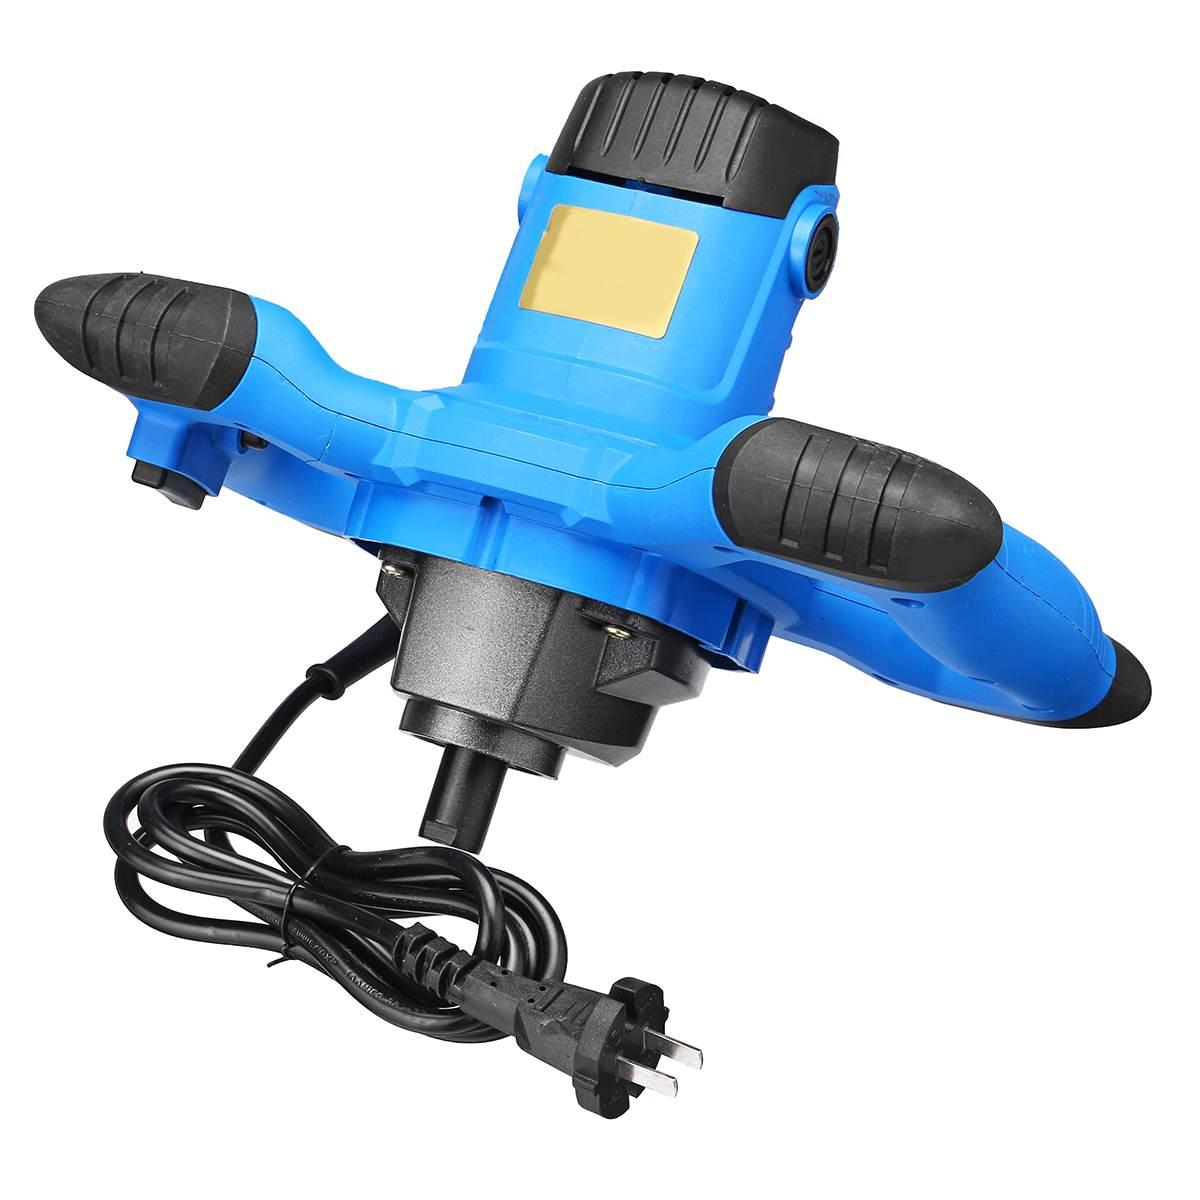 2000 w 800 rpm 220 v 6 Velocidade Paddle Mixer Agitador Elétrico Industrial Azul Handheld Máquina Para A Pintura De Cimento De Concreto argamassa Cola